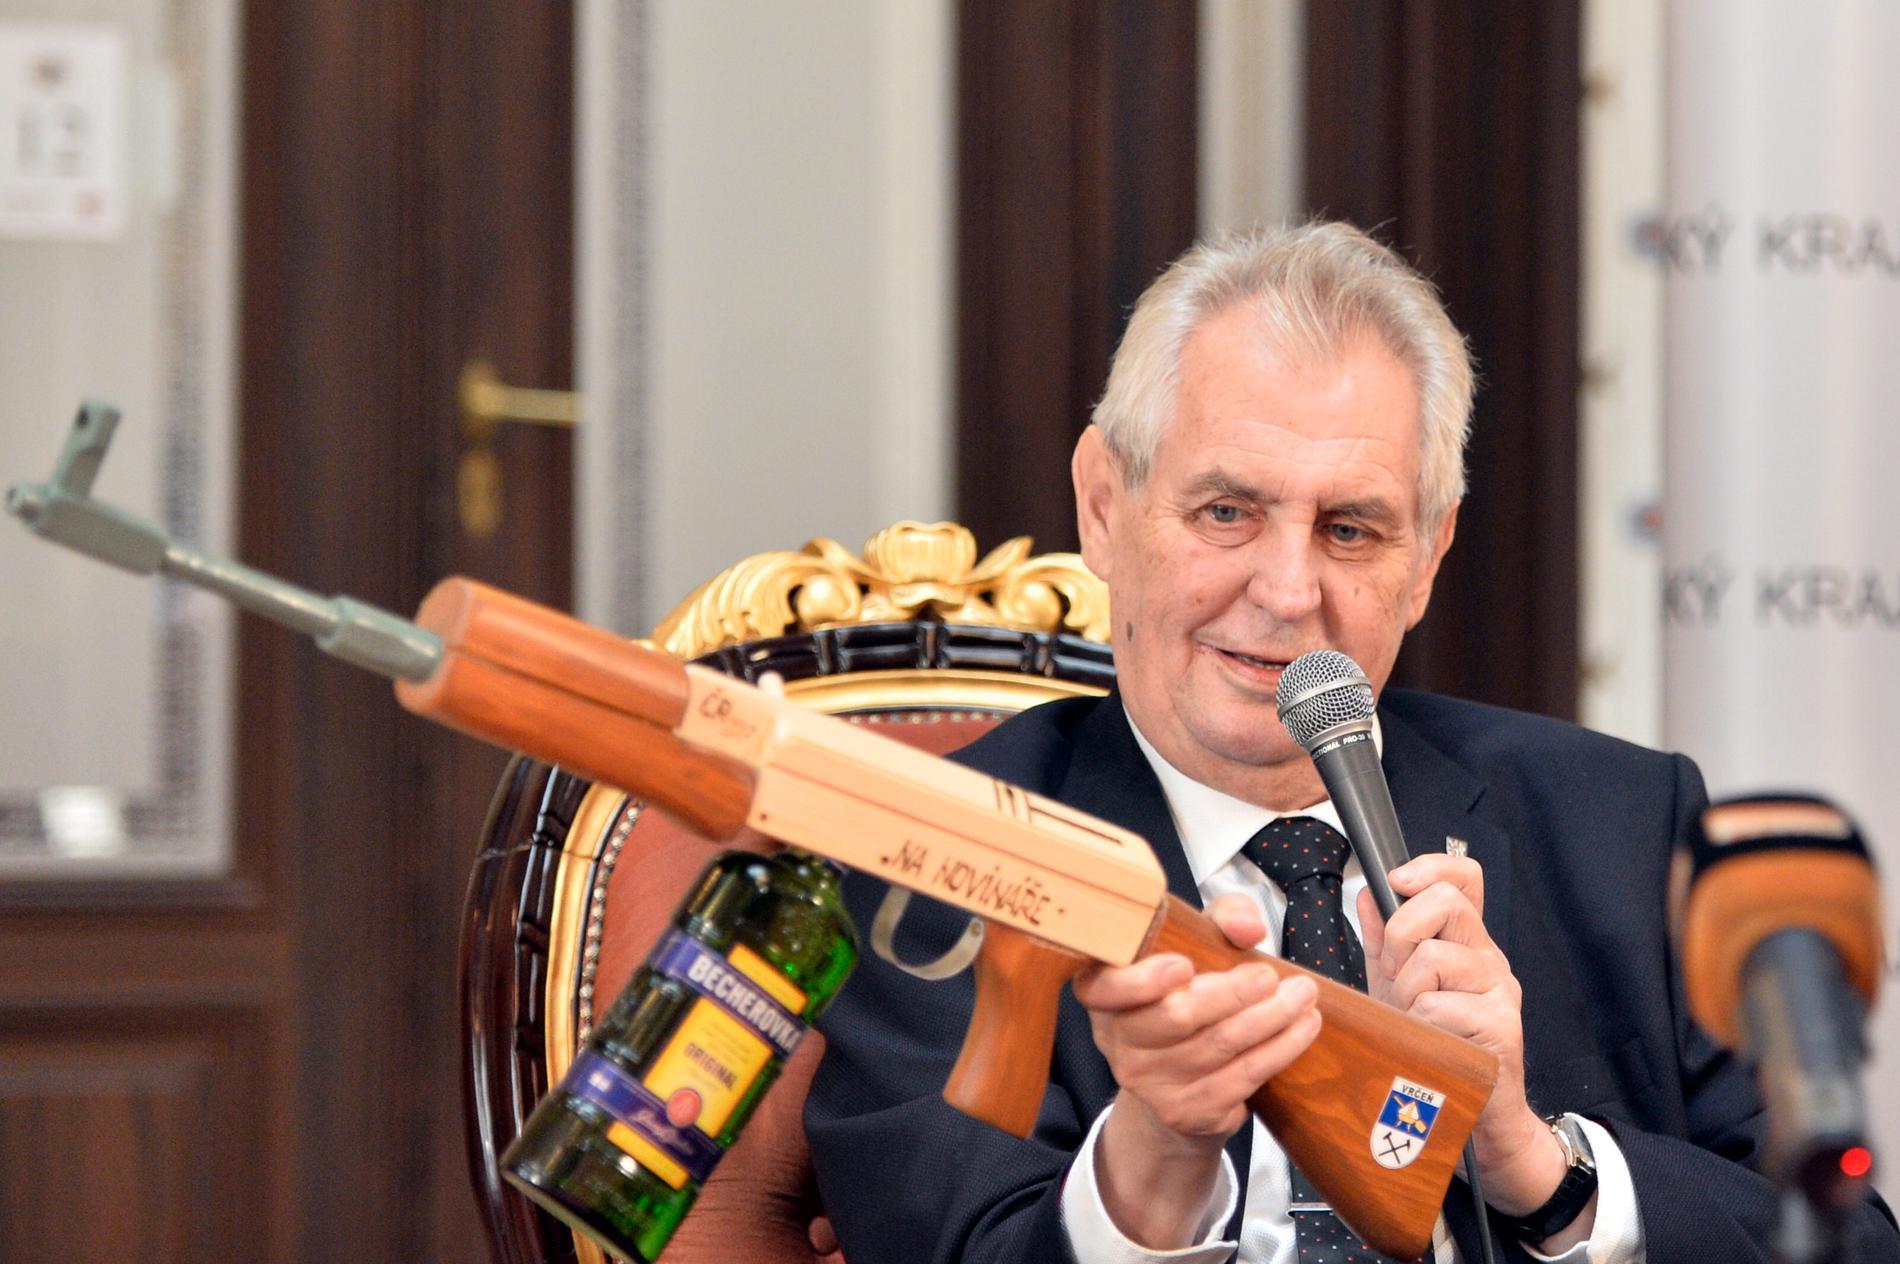 Tjeckiens president Milos Zeman viftar med en AK-47:a på presskonferensen